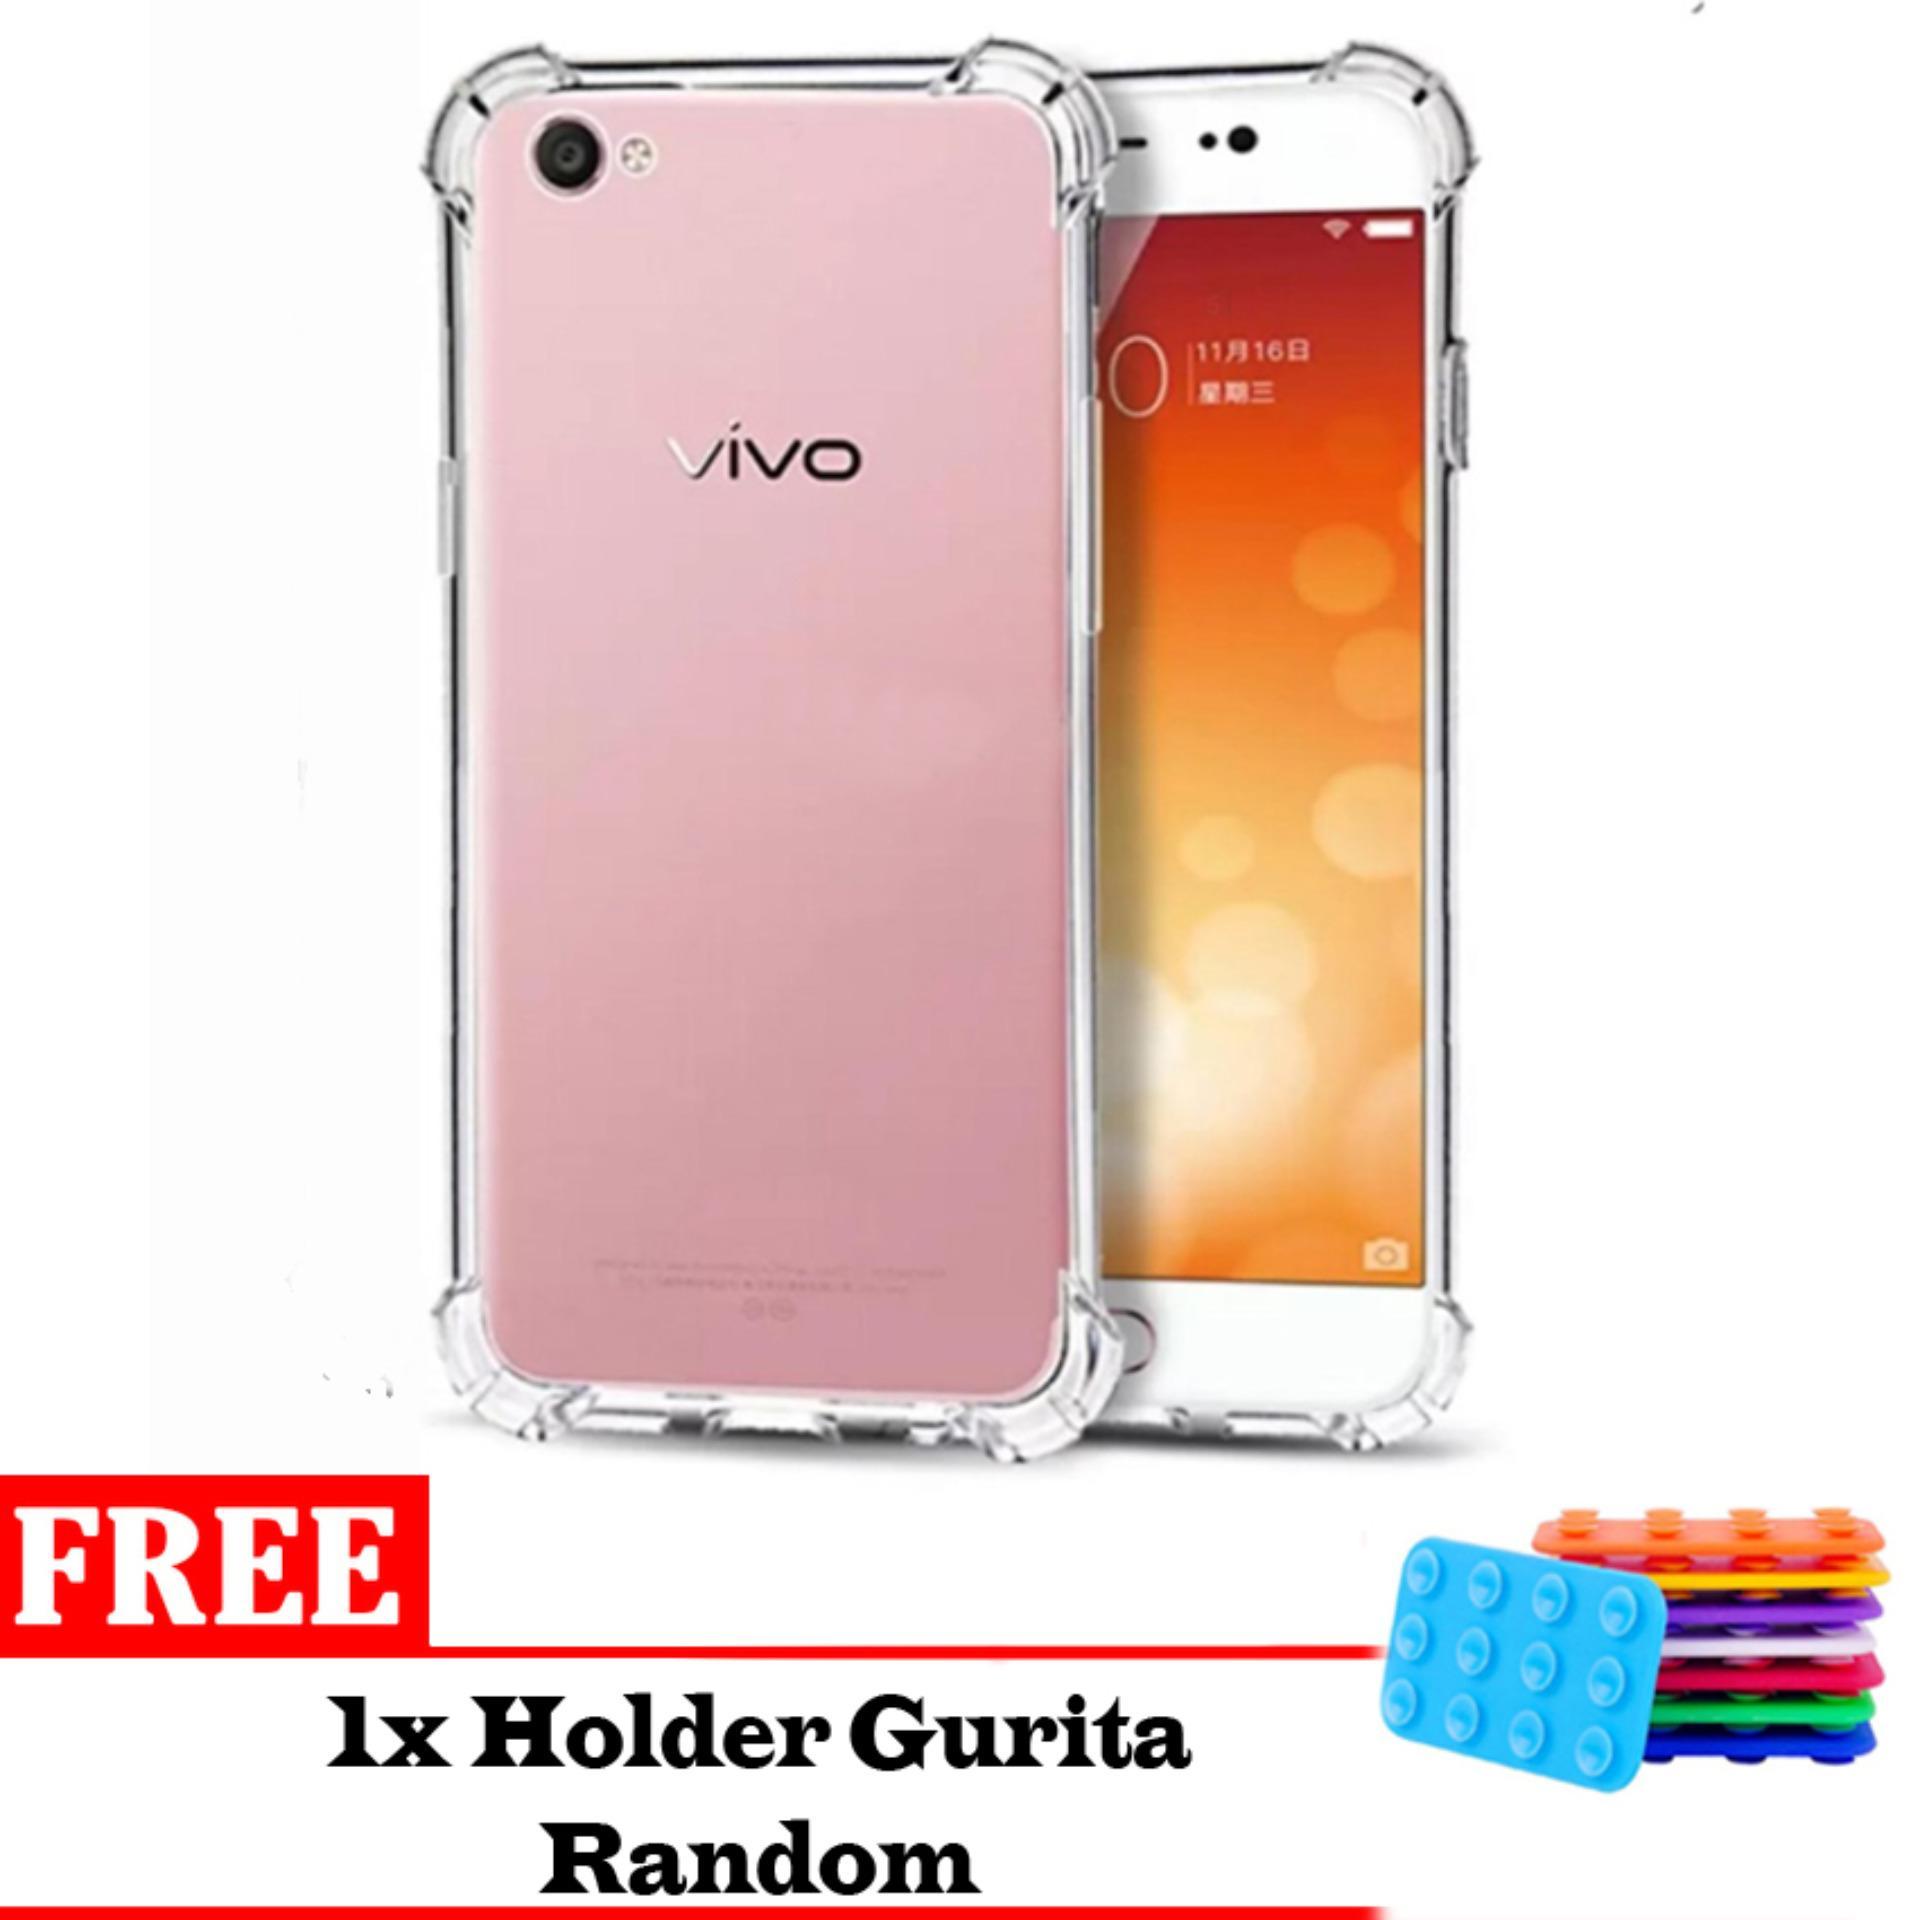 Jak Shop Soft Case Anti Crack / Anti Shock Case Vivo Y53 4G / Case Hp  - Clear Bonus Holder Gurita